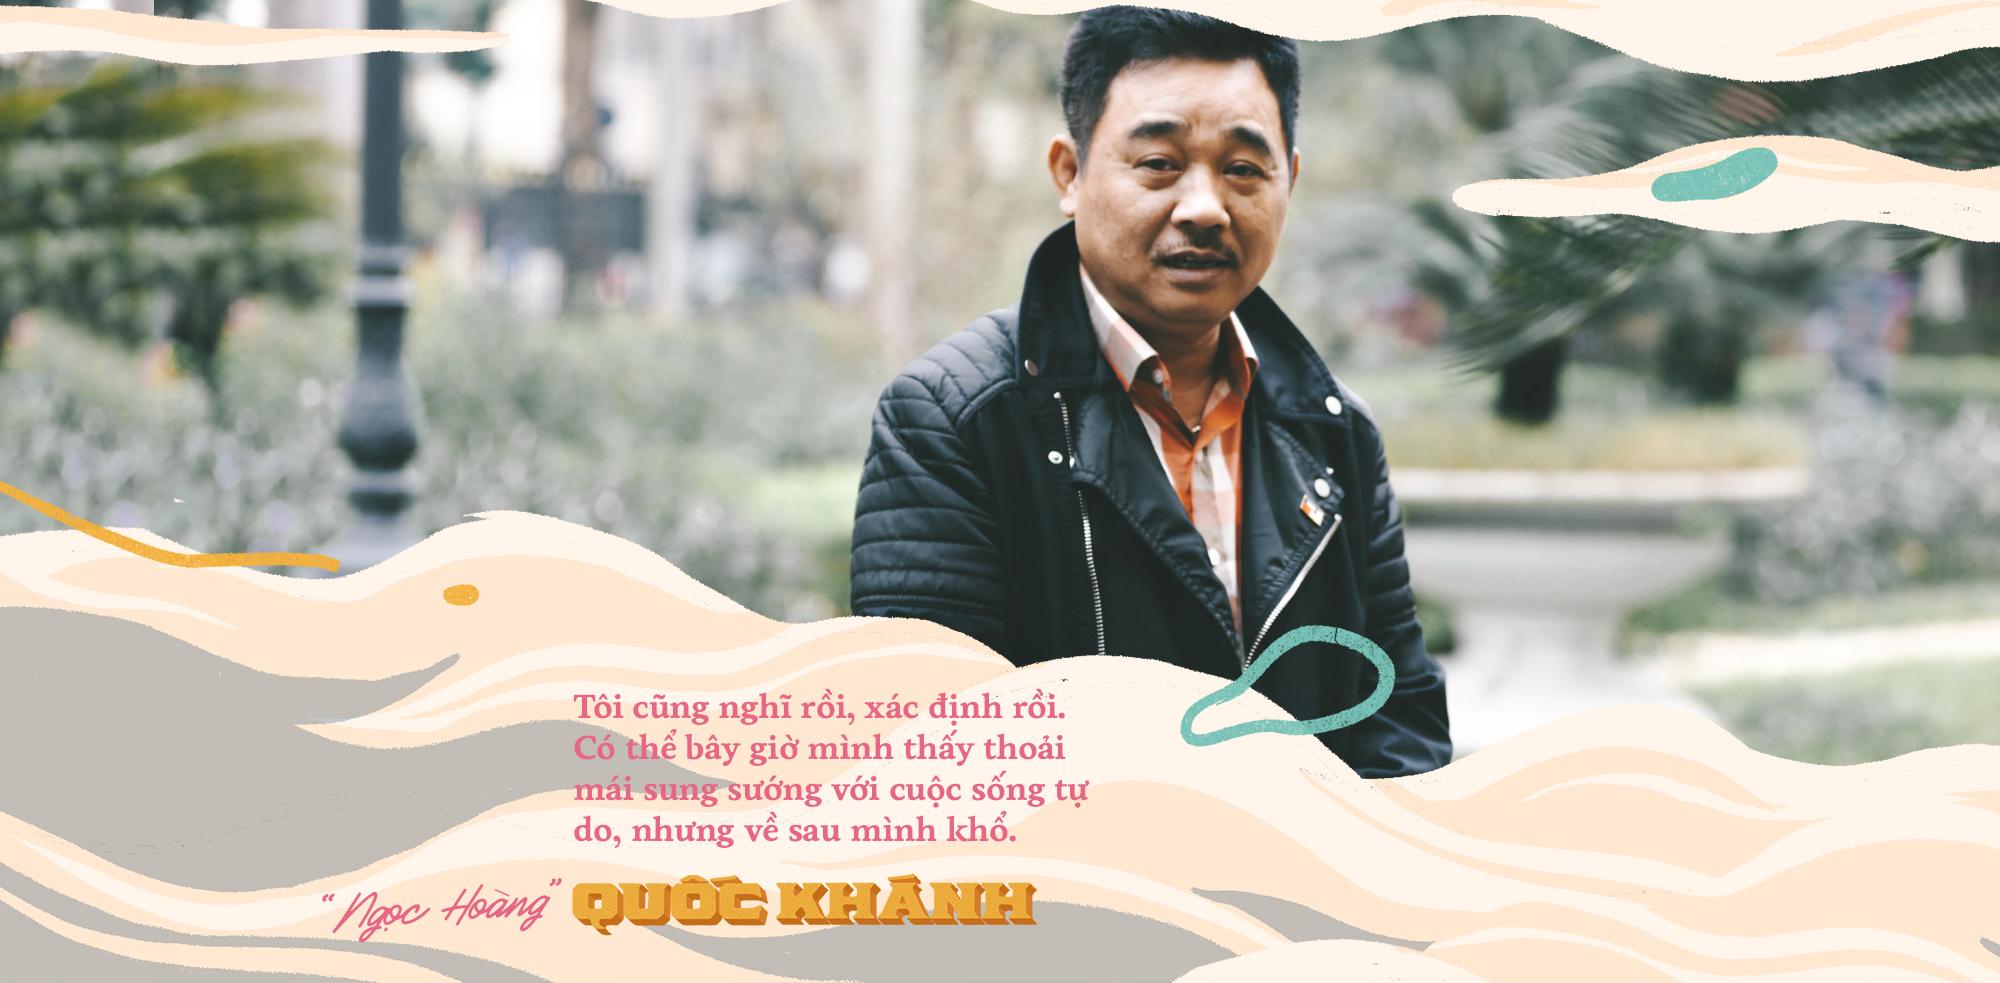 'Ngoc Hoang' Quoc Khanh: Toi chon tu do, sau nay ve gia chiu canh dau don khong ai cham soc hinh anh 2